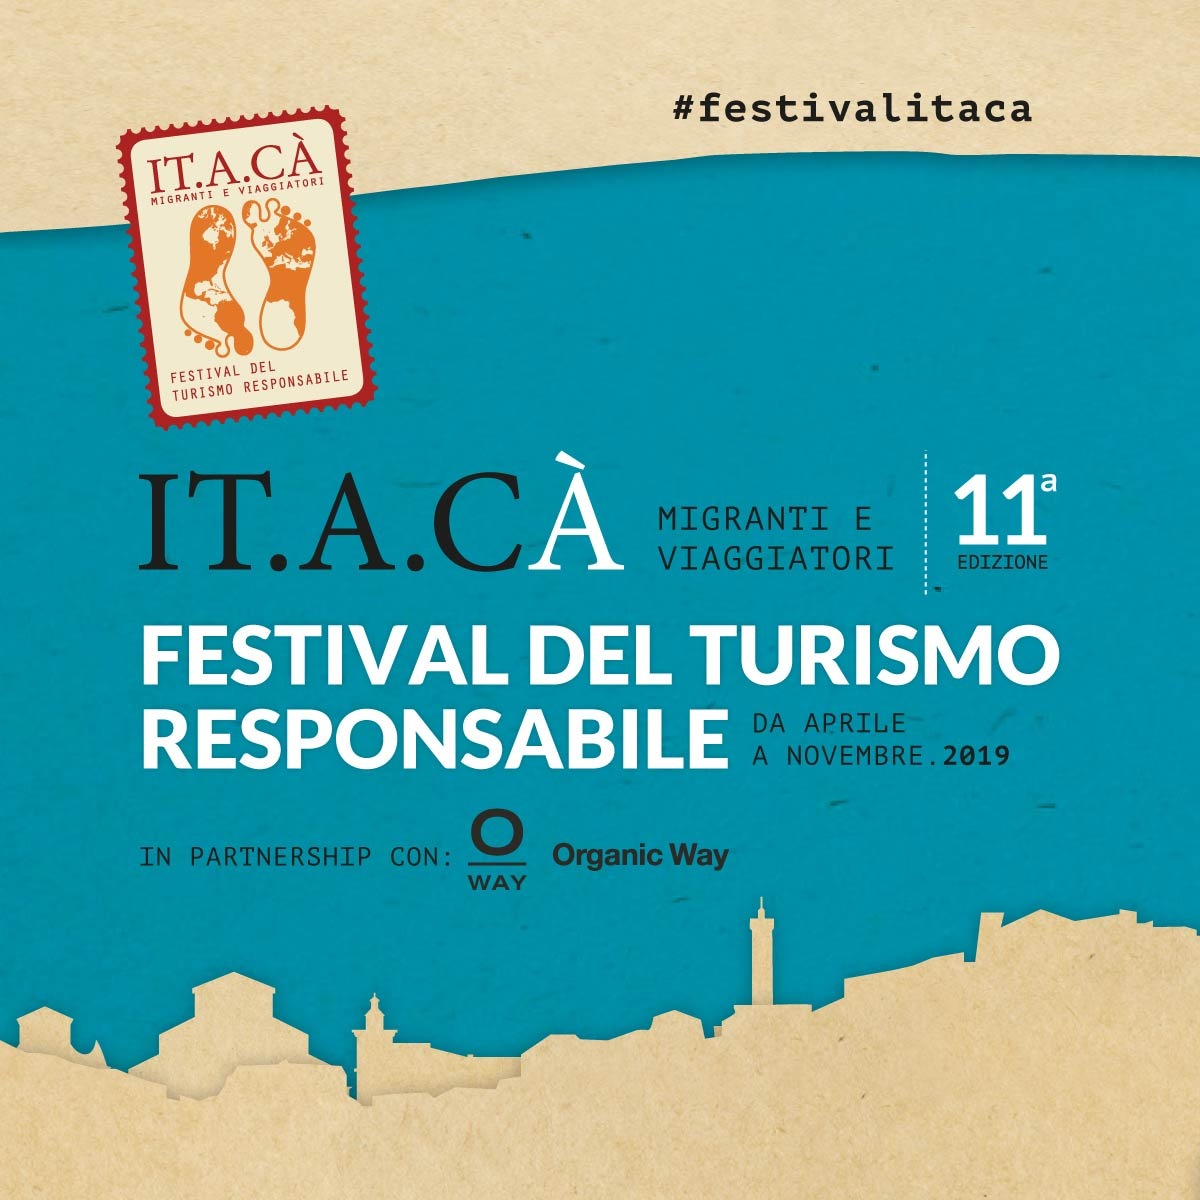 festival-itaca-strategia-eventi-turismo-sostenibile-branding-2